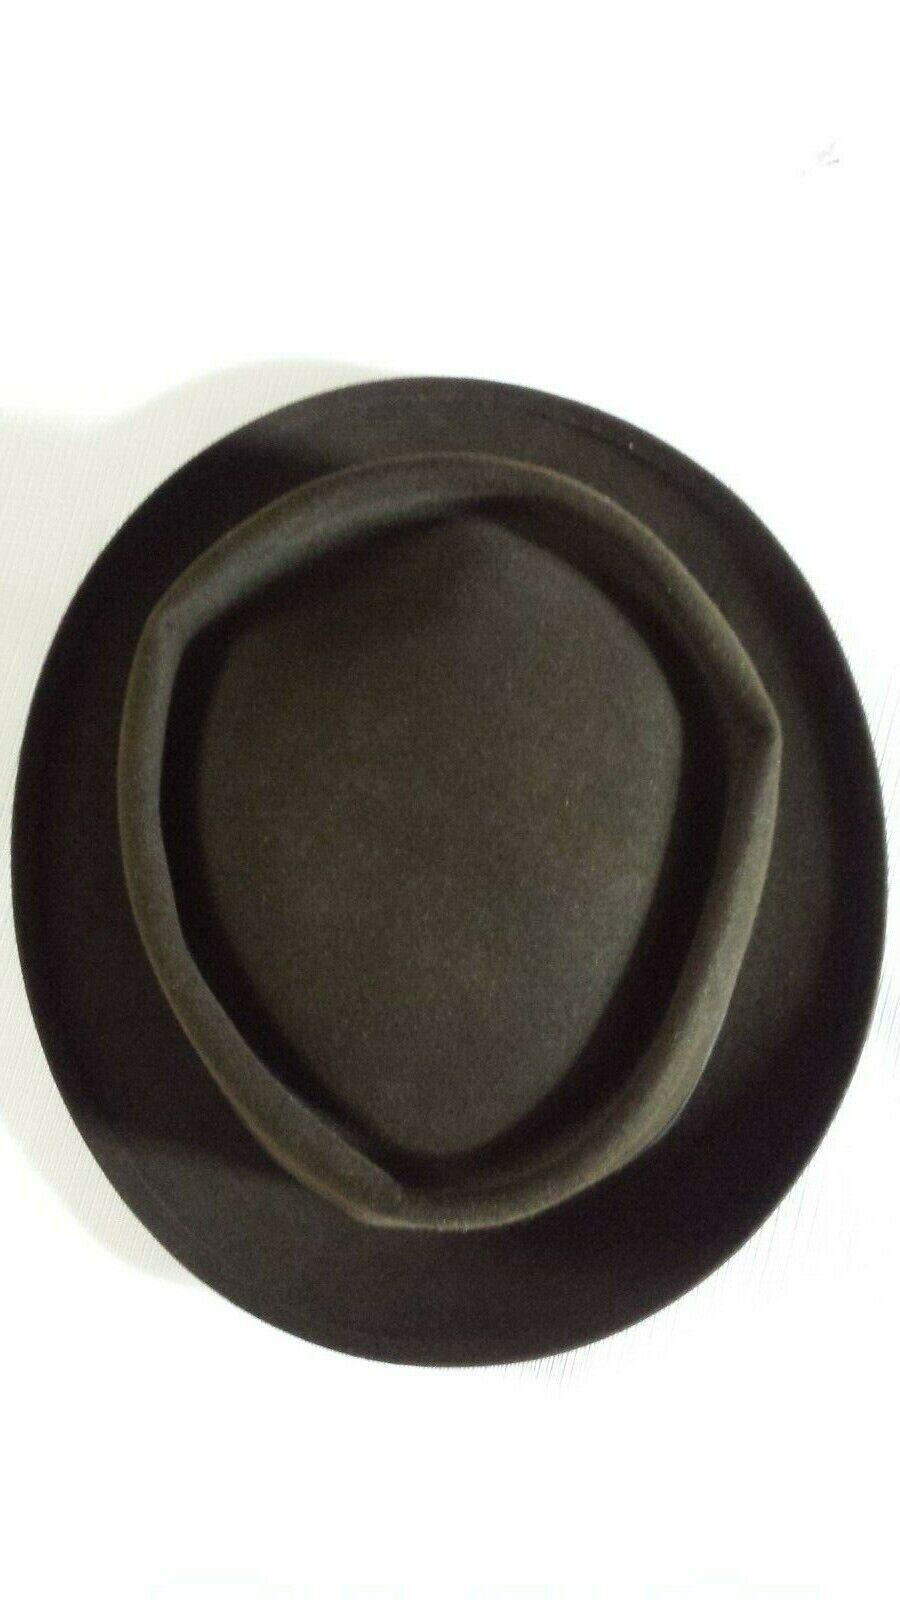 Vintage Mallory Pork Pie Style Felt Hat Size 7 1/8 - image 5